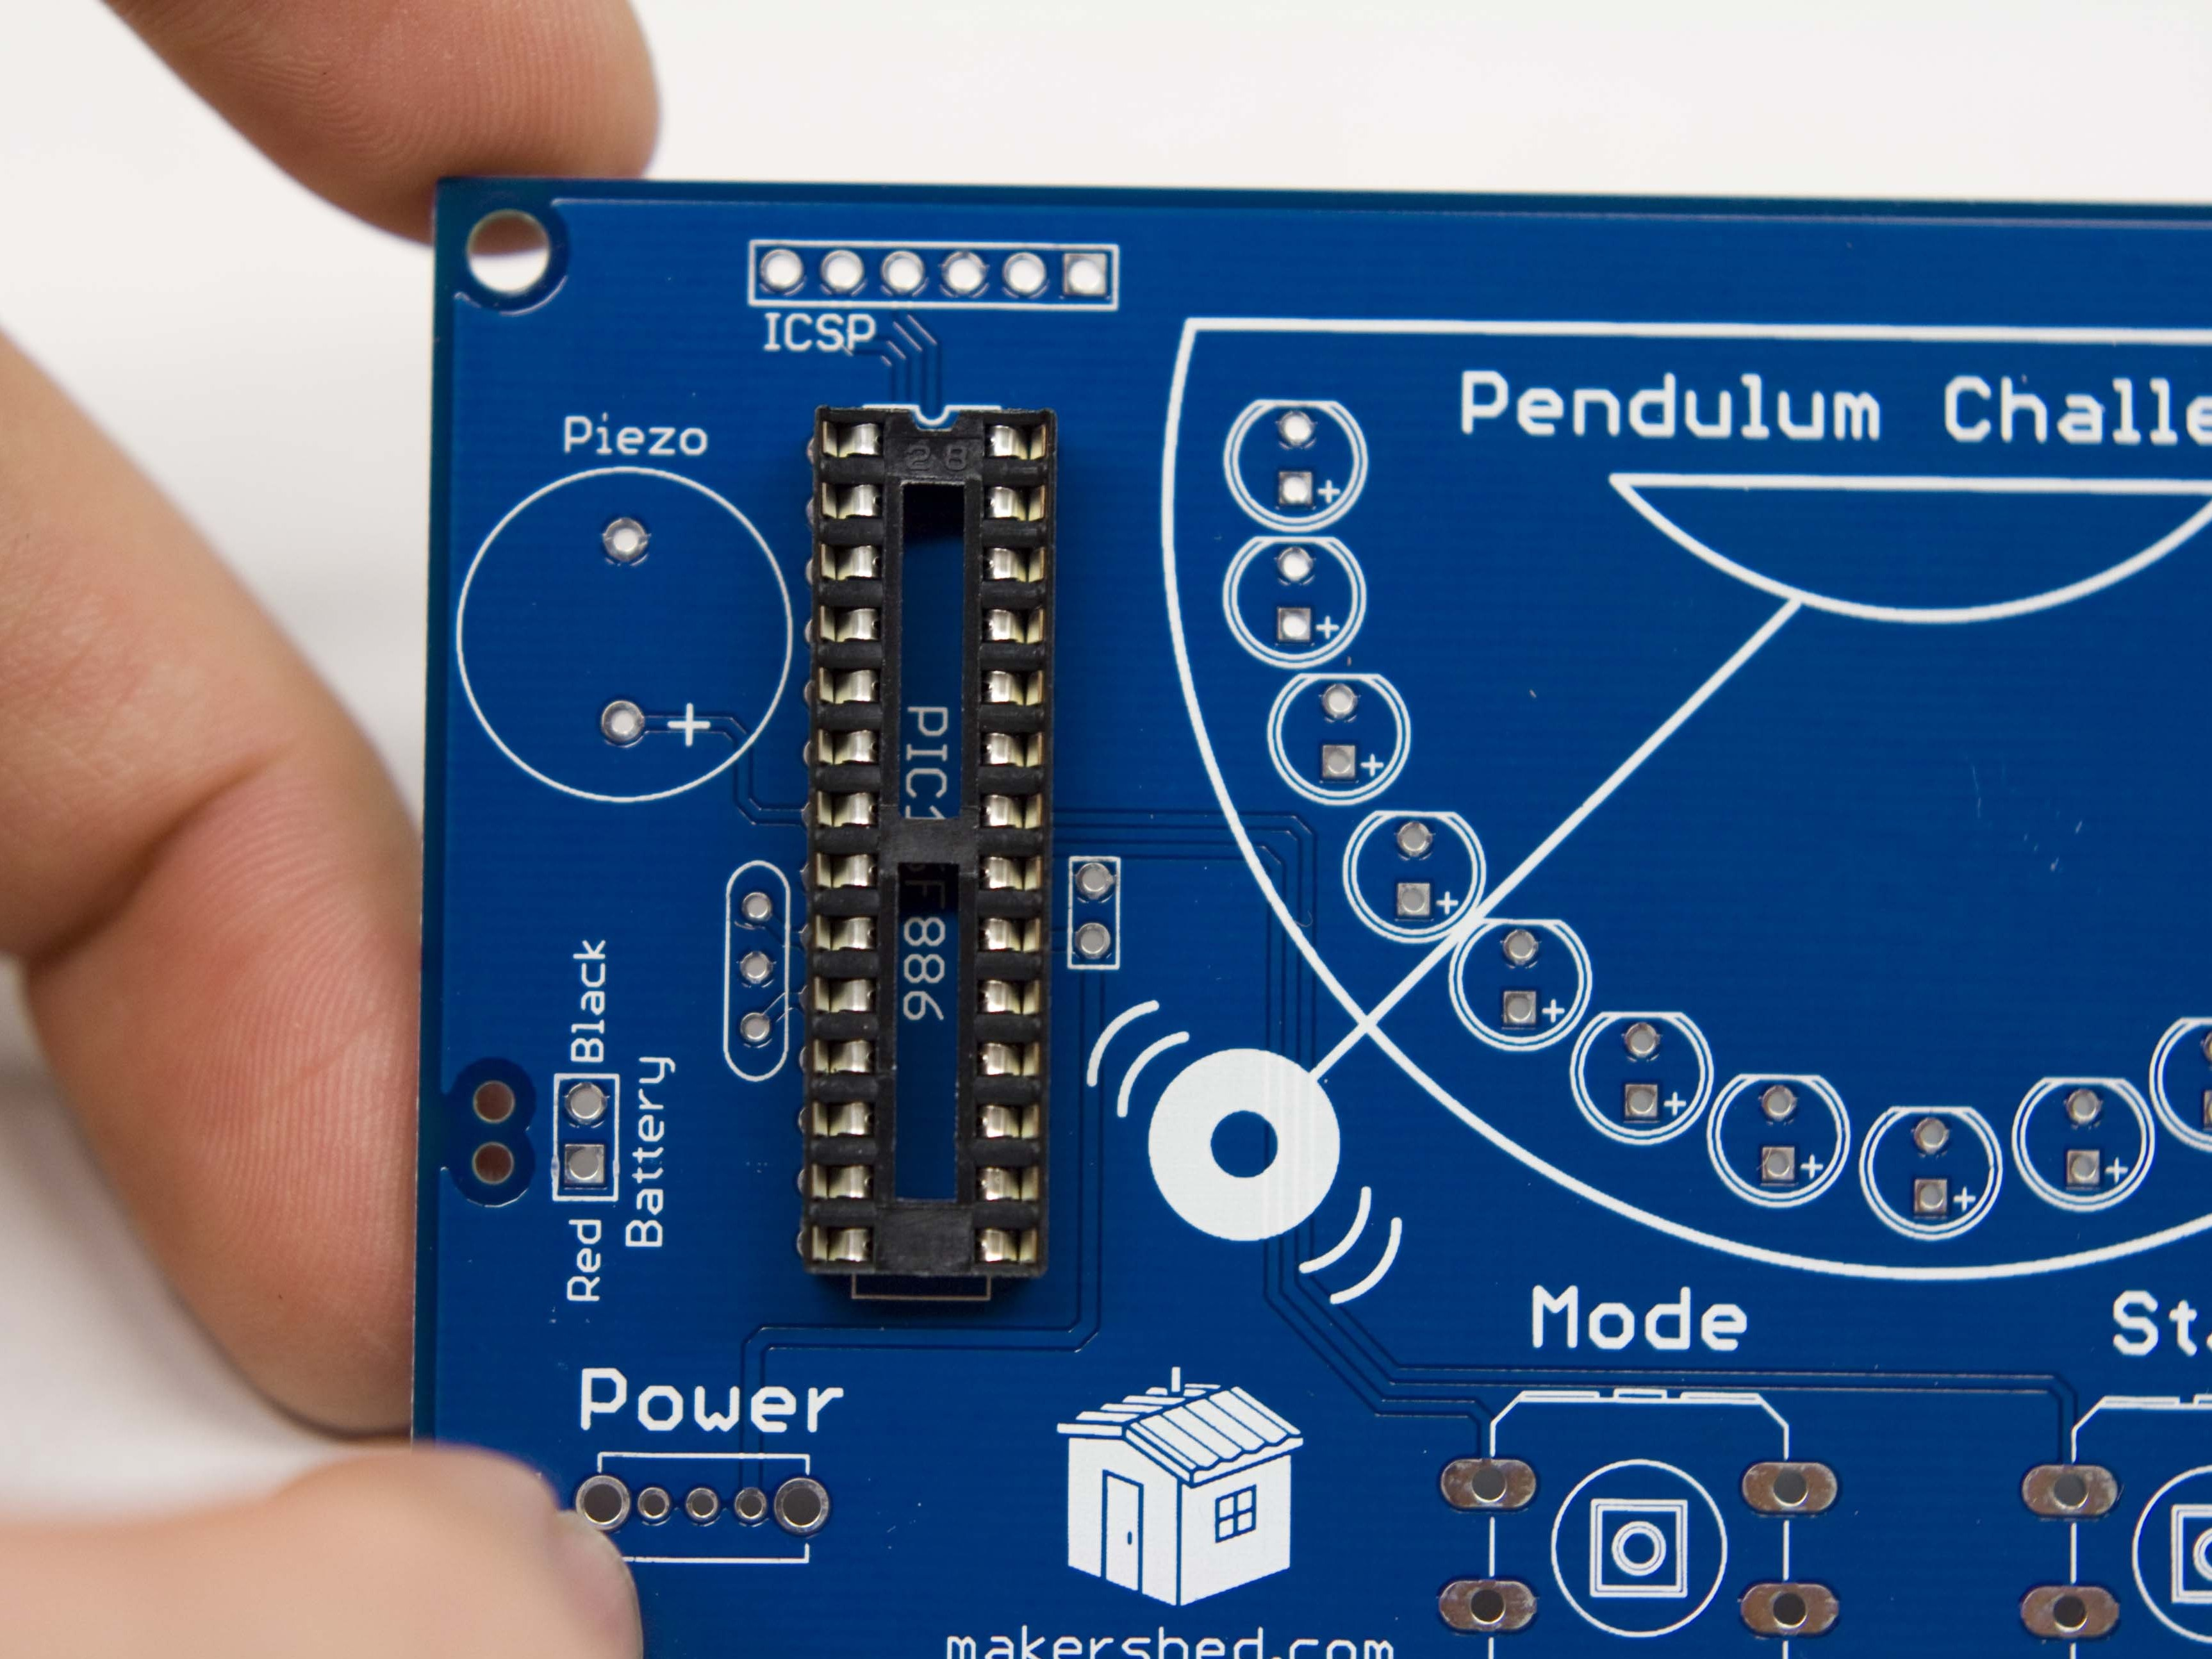 Pendulum Challenge Build